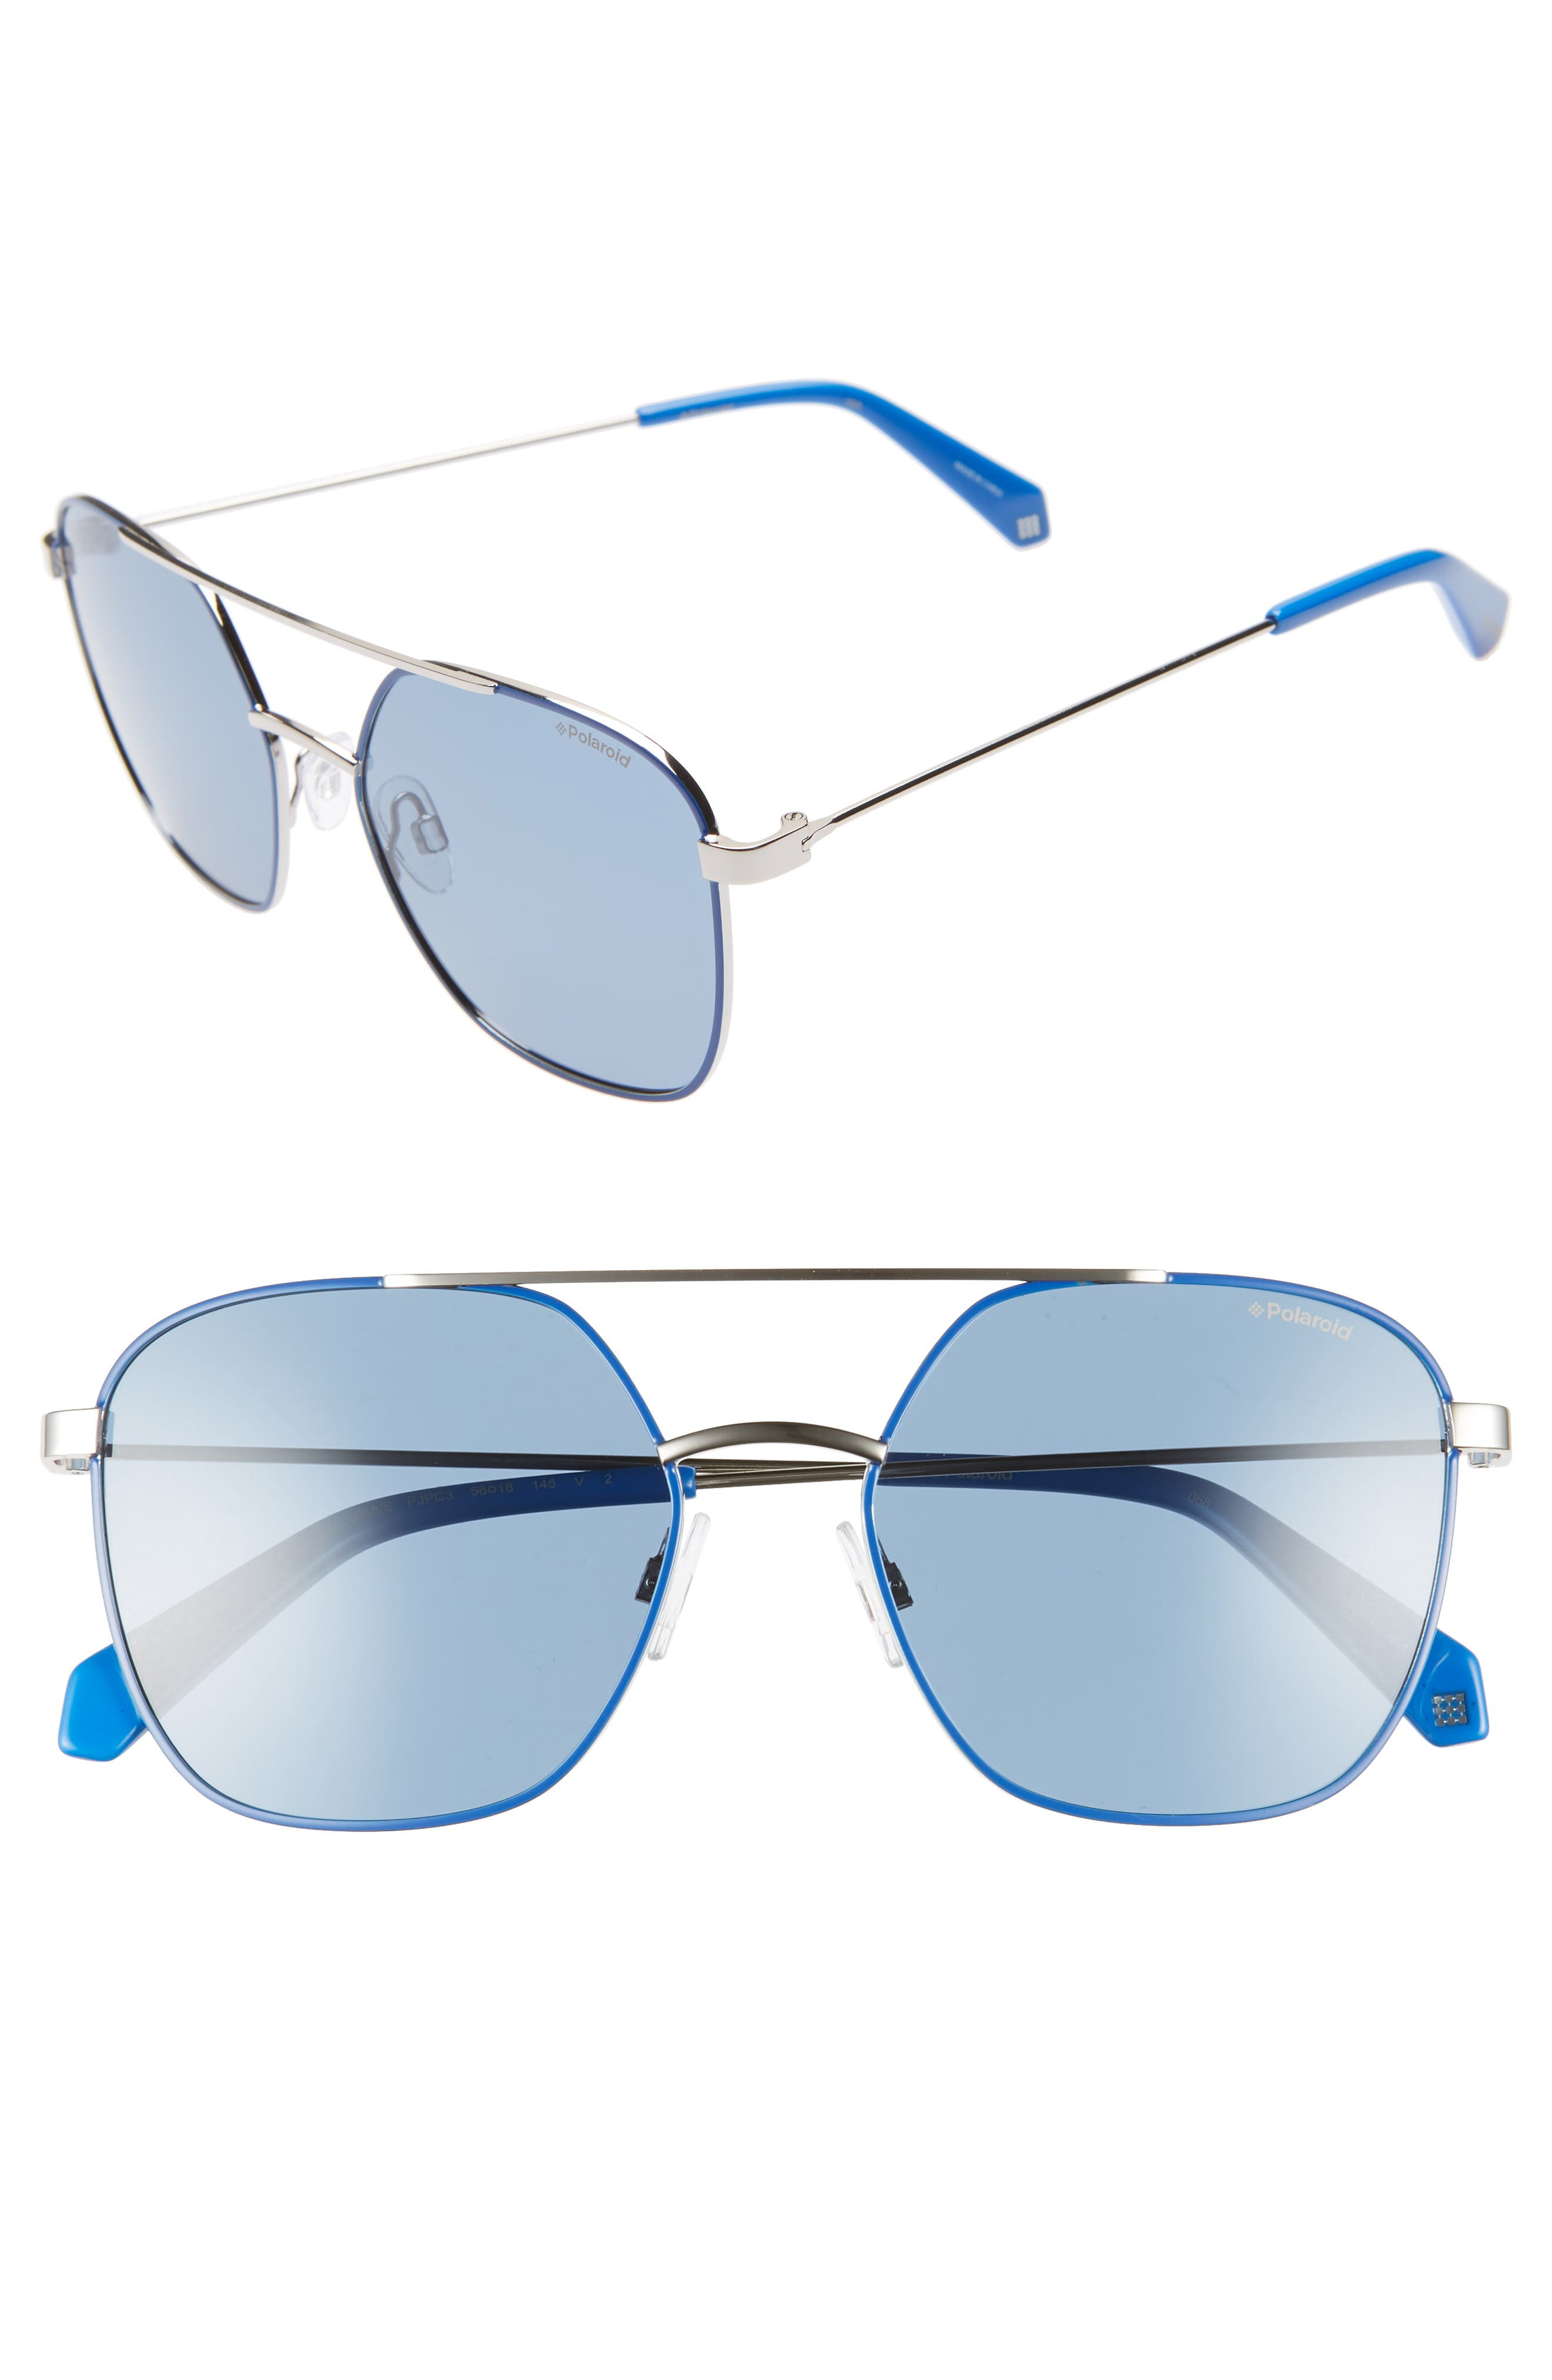 Polaroid 5m Polarized Square Aviator Sunglasses - Blue/ Silver